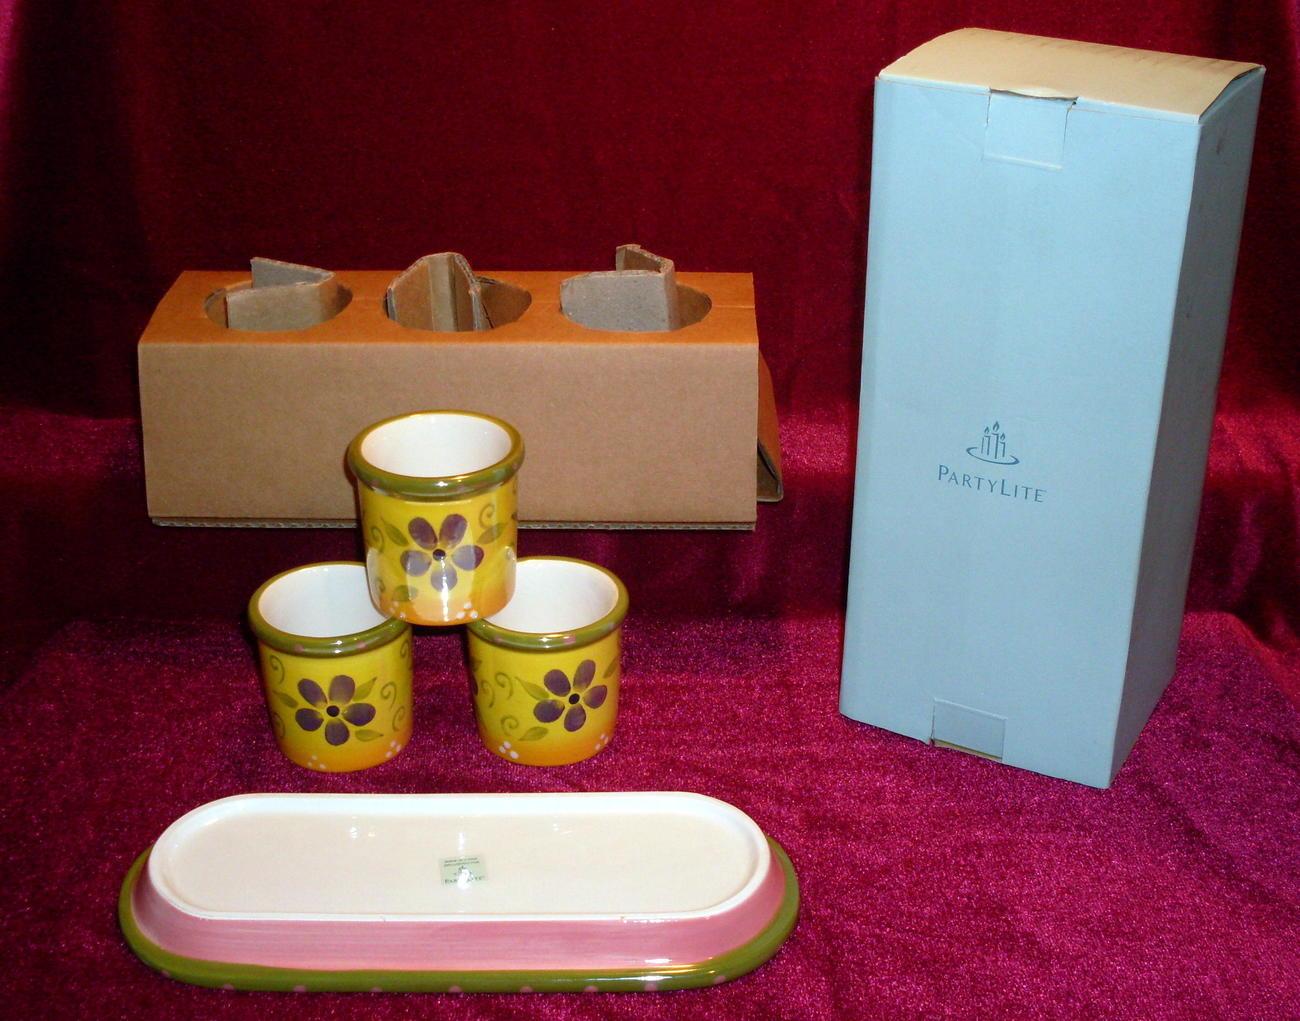 partylite flower pot trio p9270 nib votive holders or herb pots candle holders. Black Bedroom Furniture Sets. Home Design Ideas